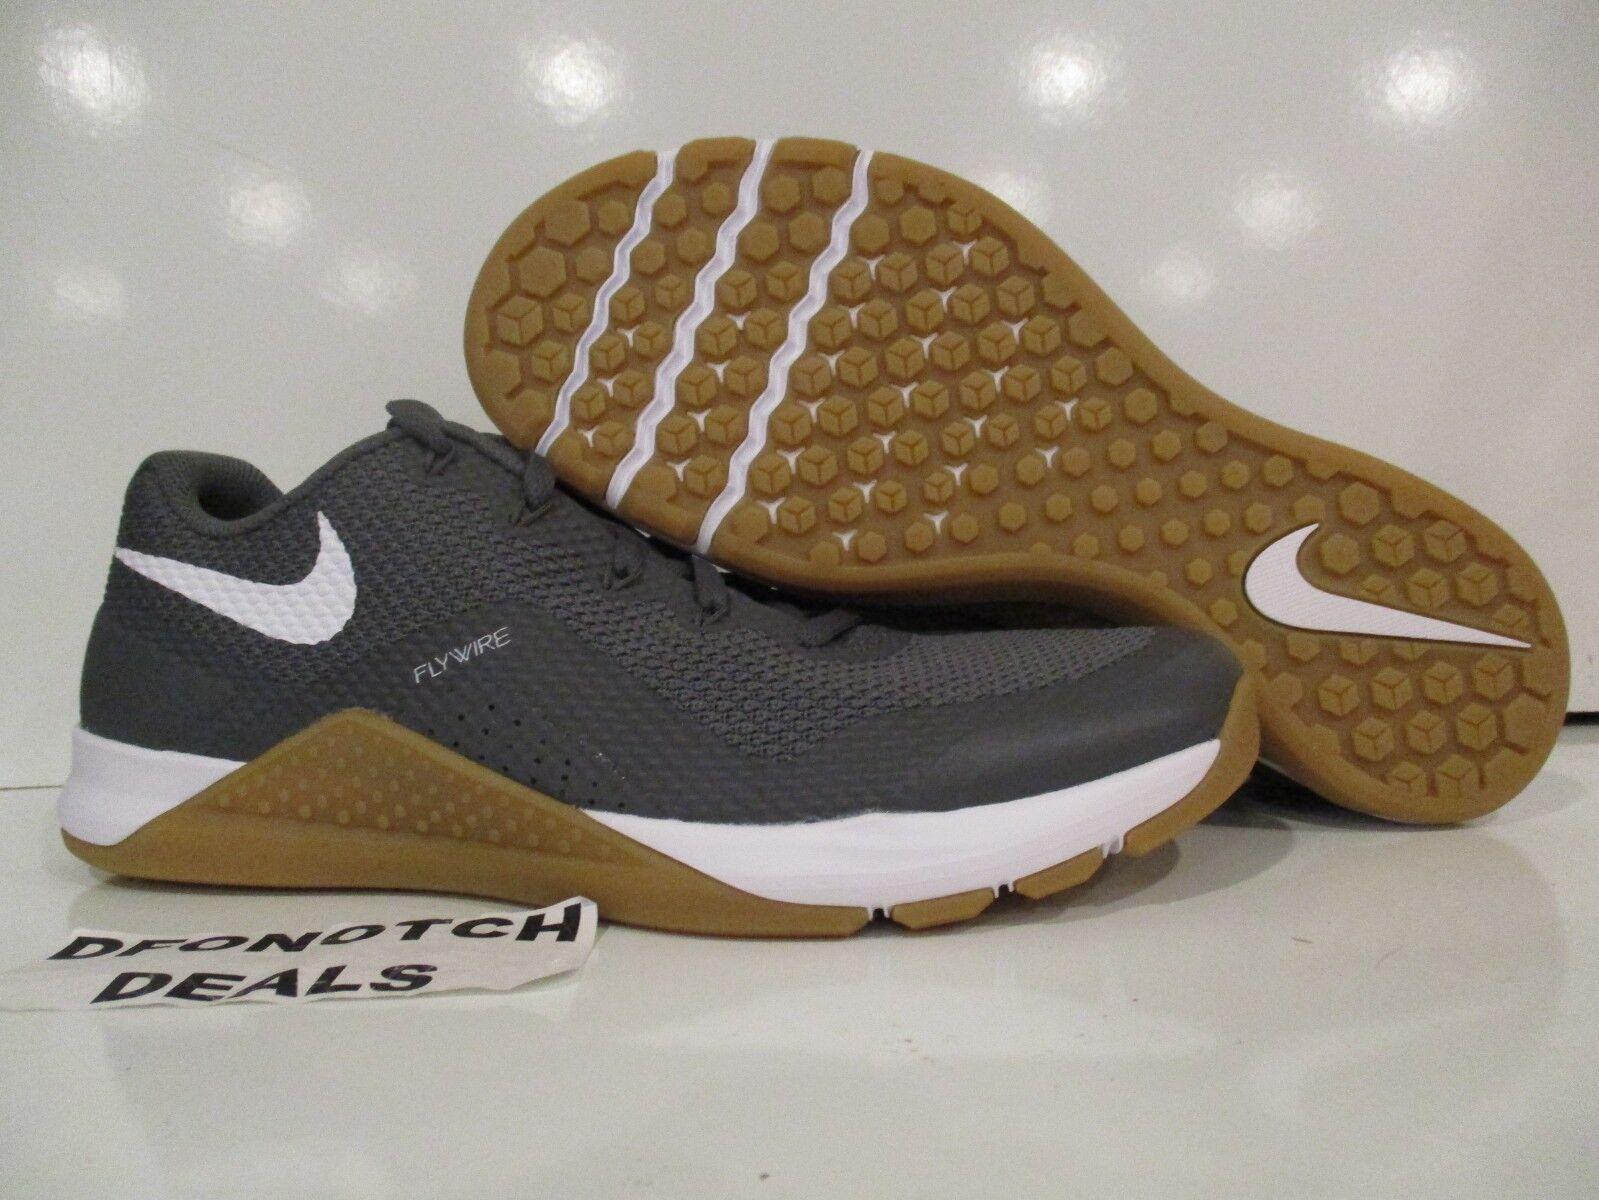 Nike Metcon Repper DSX Crossfit Training shoes Sz 10 Grey White Gum 898048-009